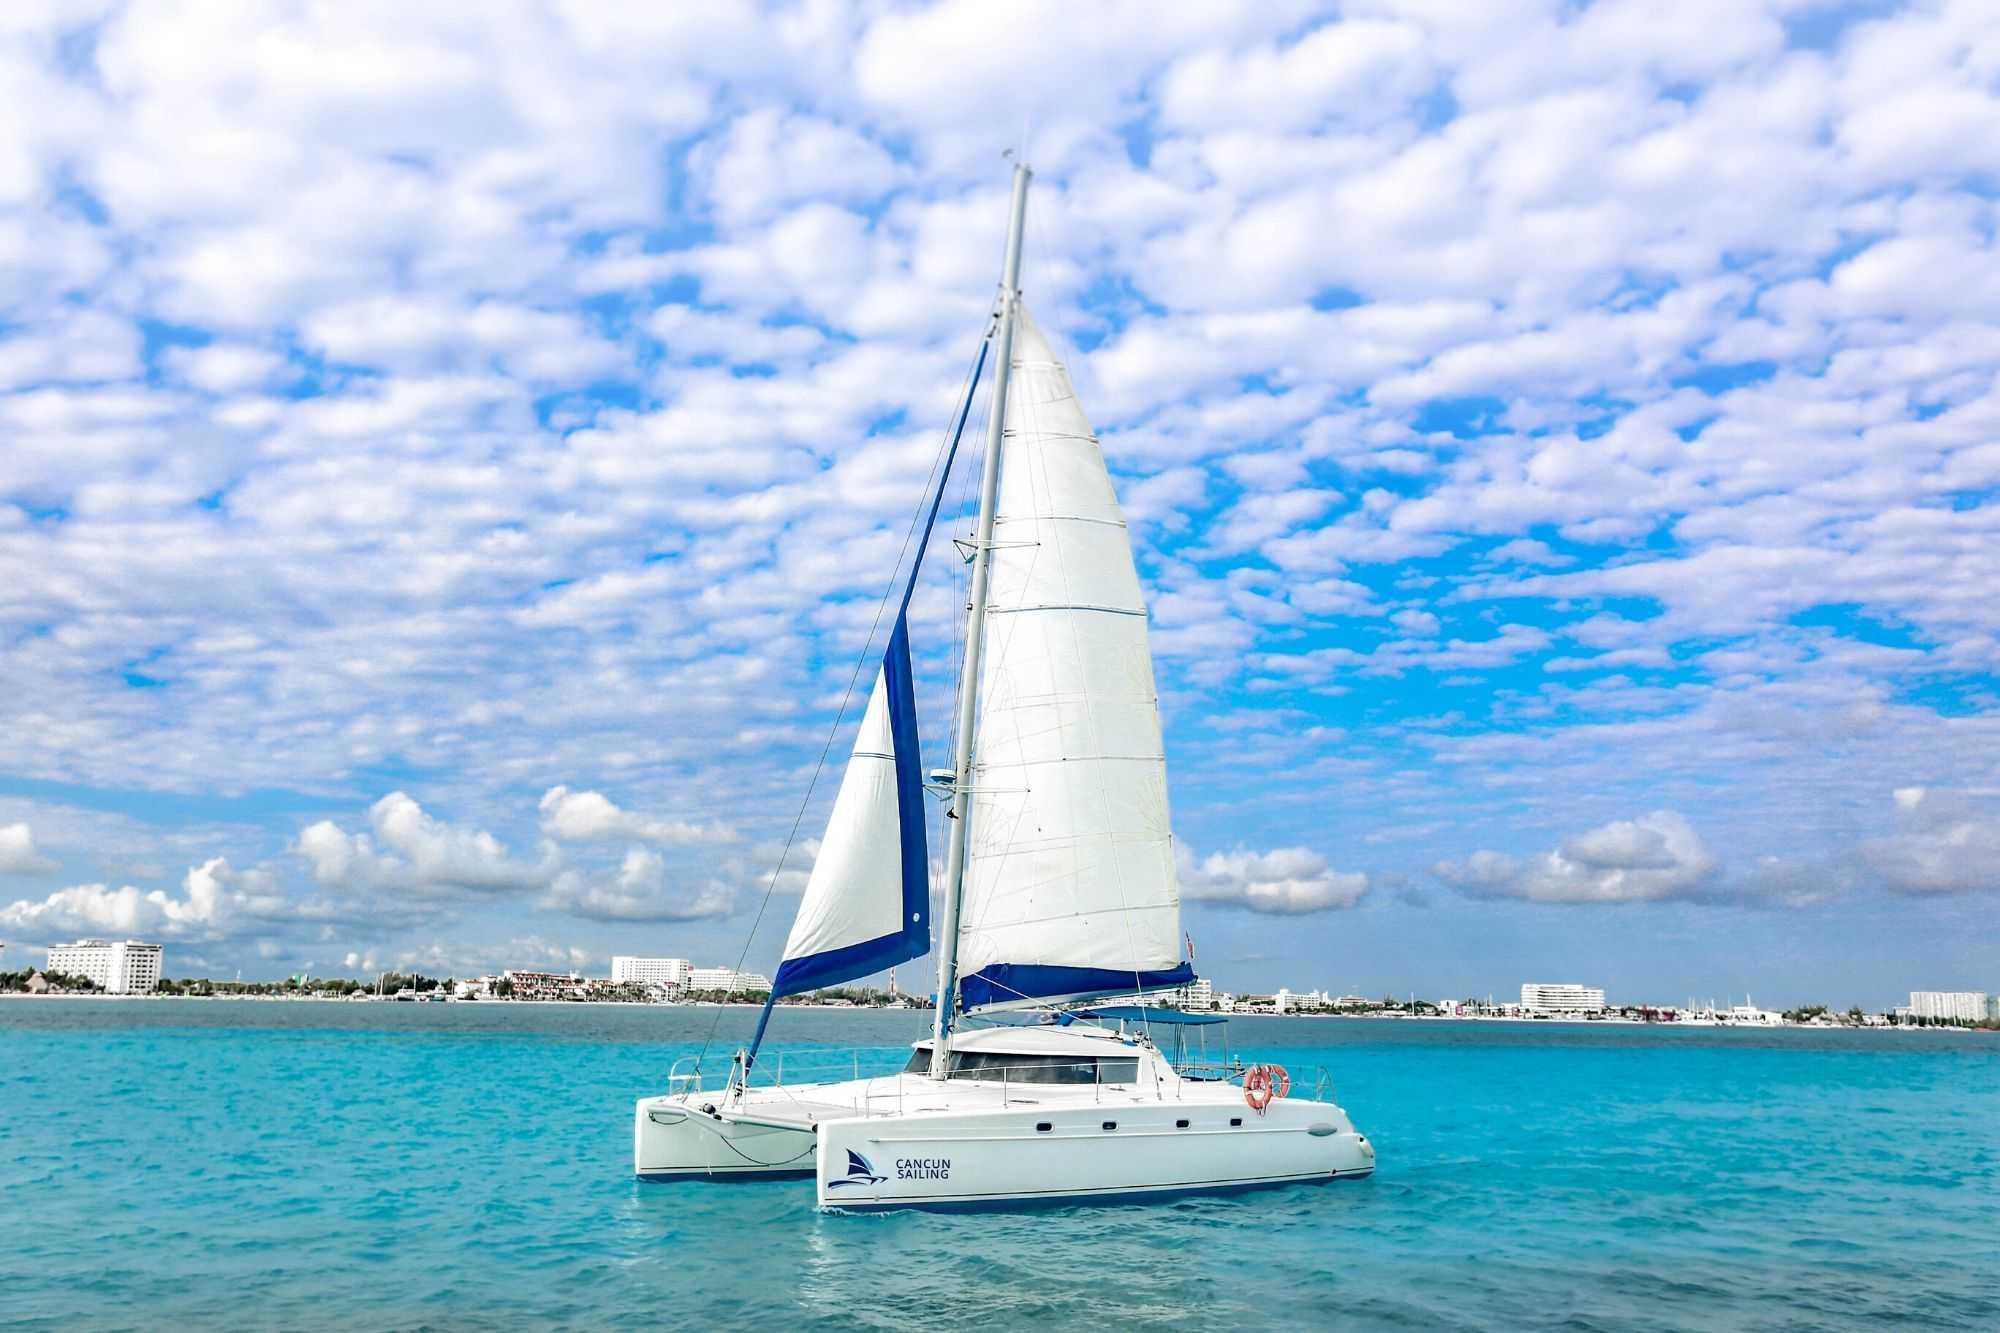 4 Vents - Isla Mujeres Catamaran Tour - Cancun Sailing 4